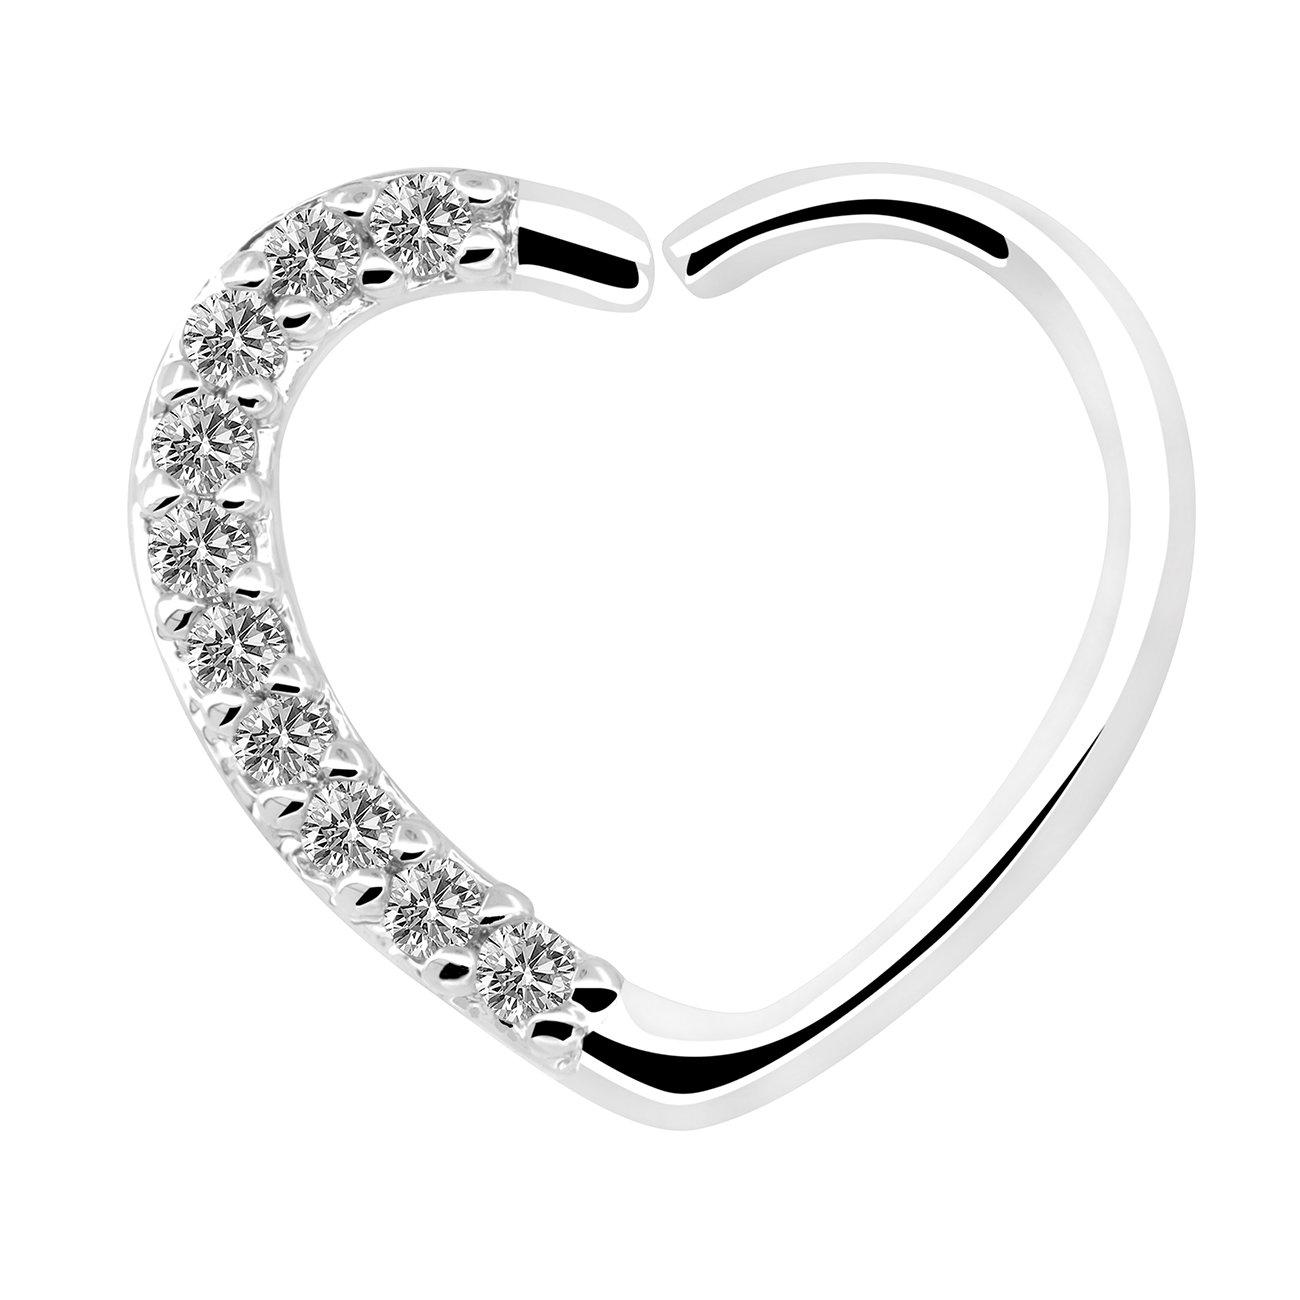 OUFER Body Jewelry 16 Gauge 18Kt Oro Blanco Chapado Claro CZ En forma de corazón Cierre